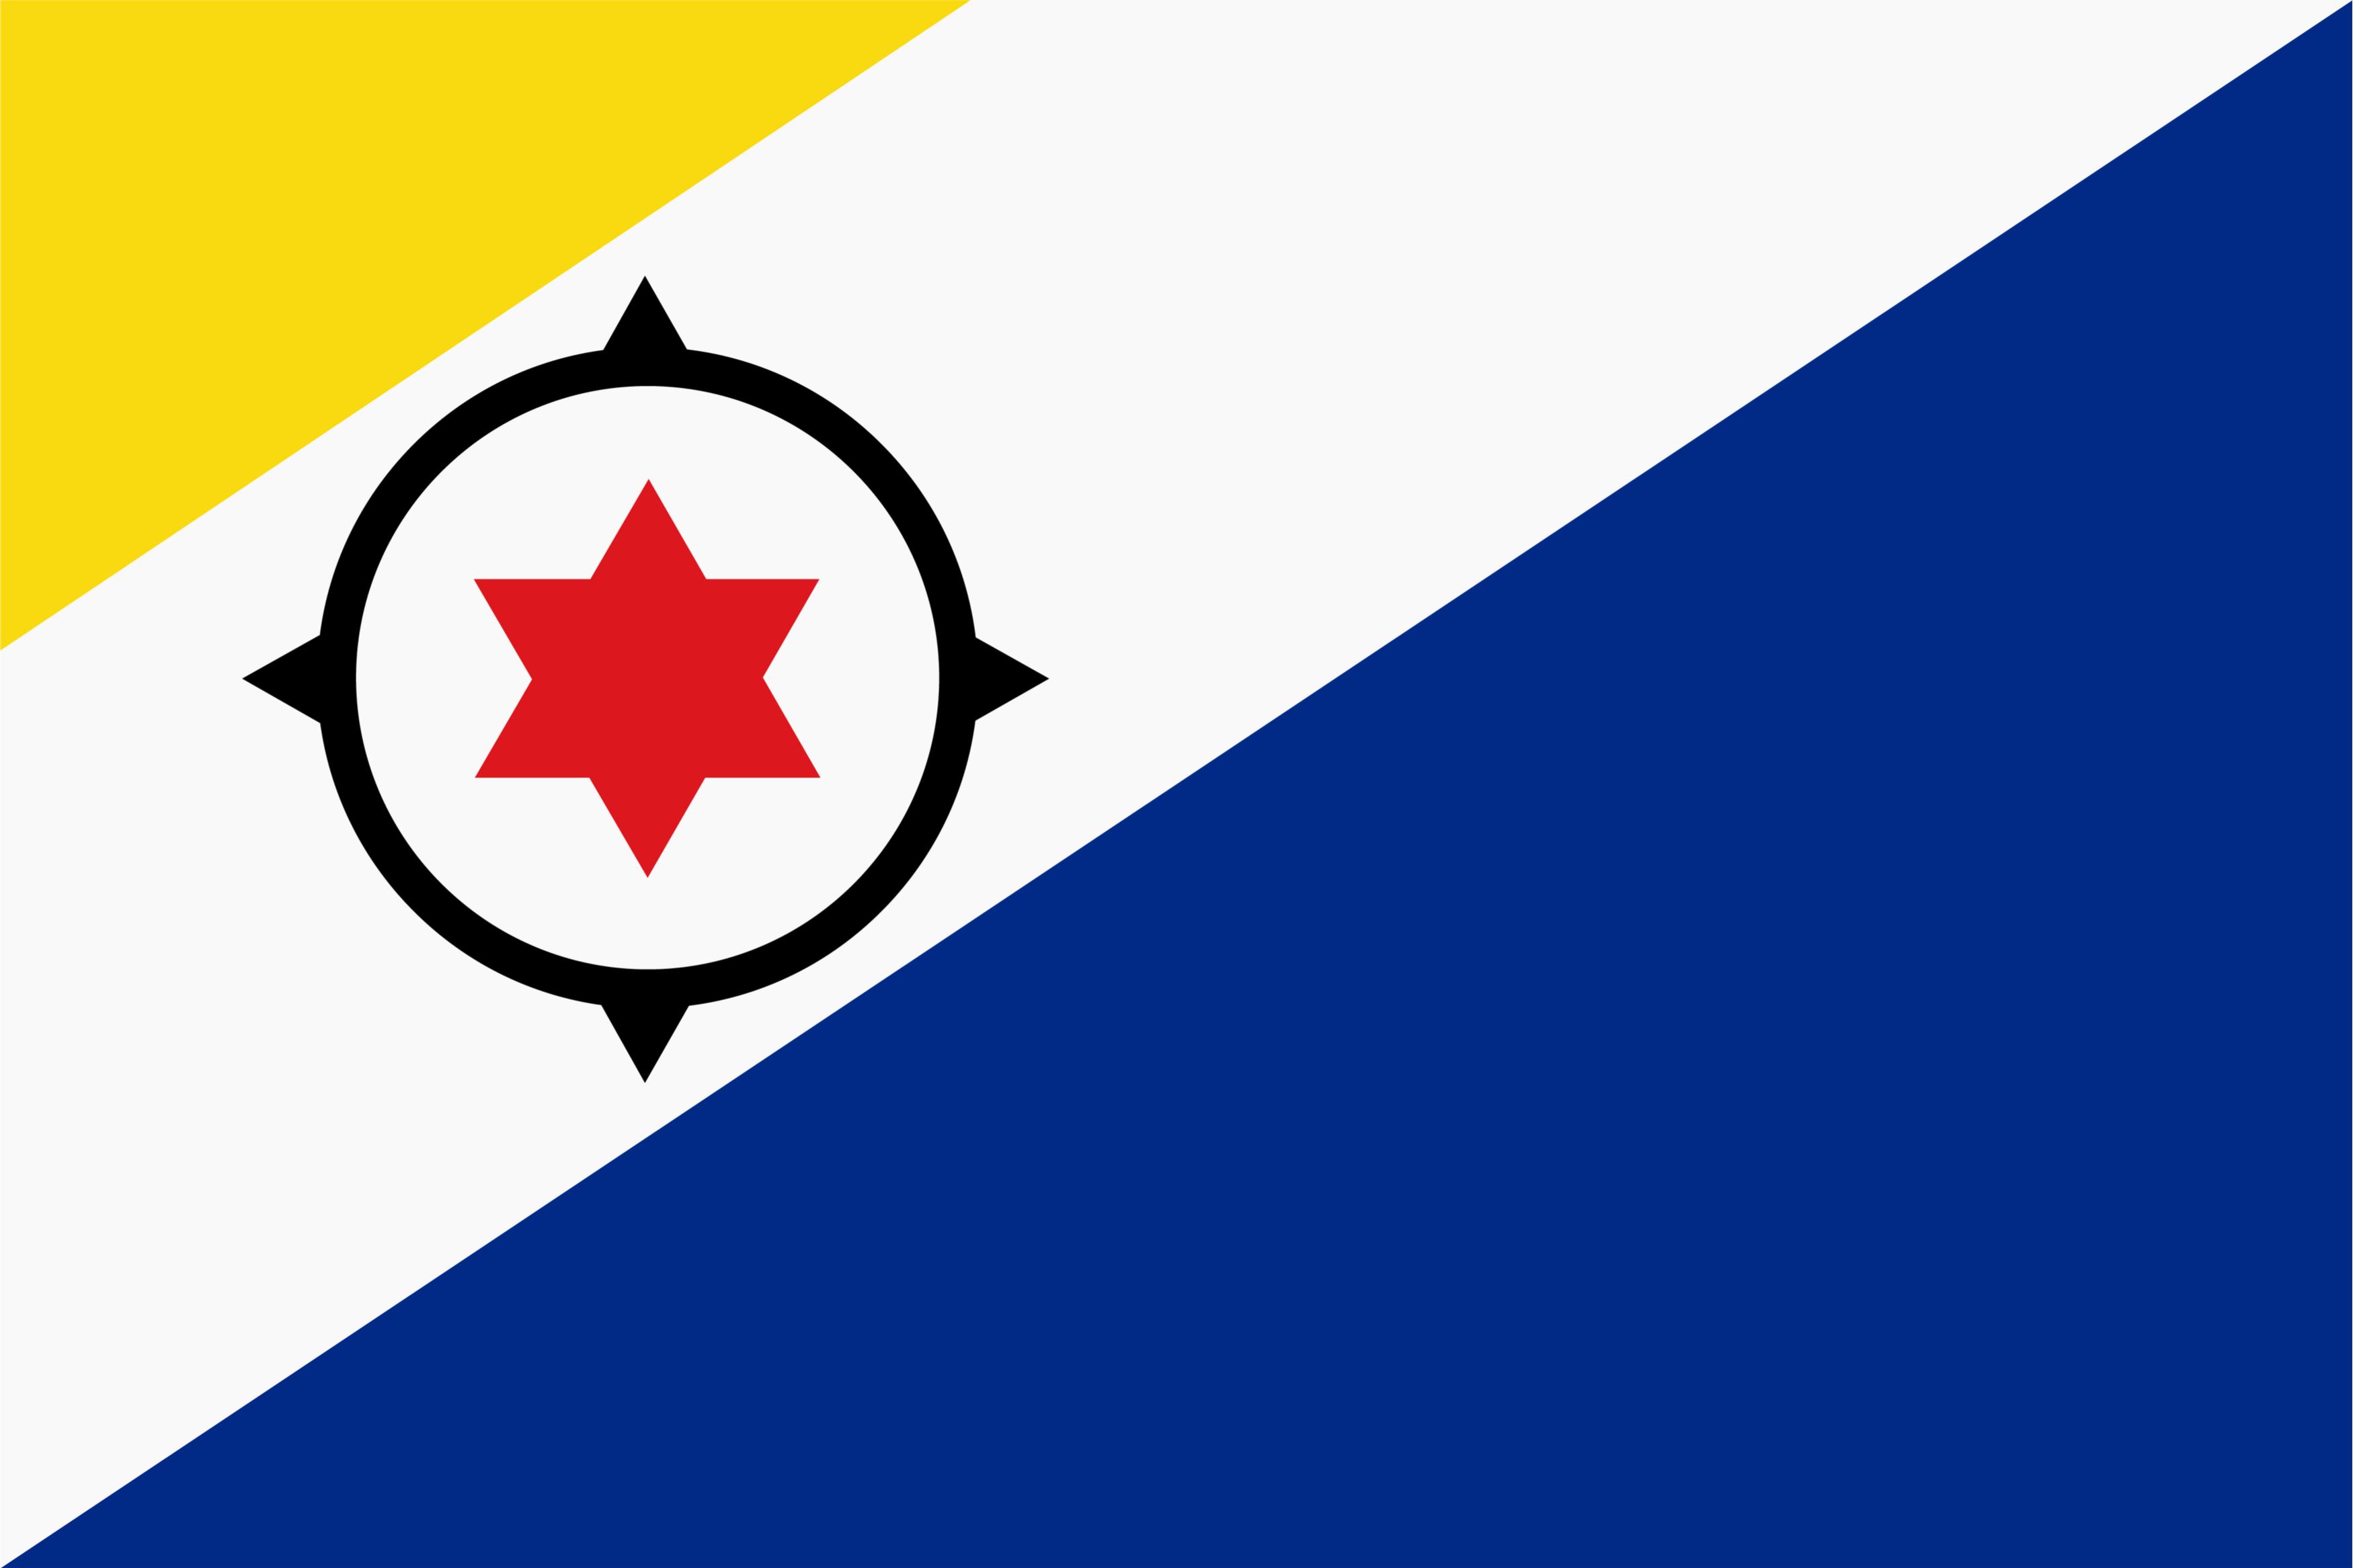 Flag of Bonaire, Saint Eustatius and Saba